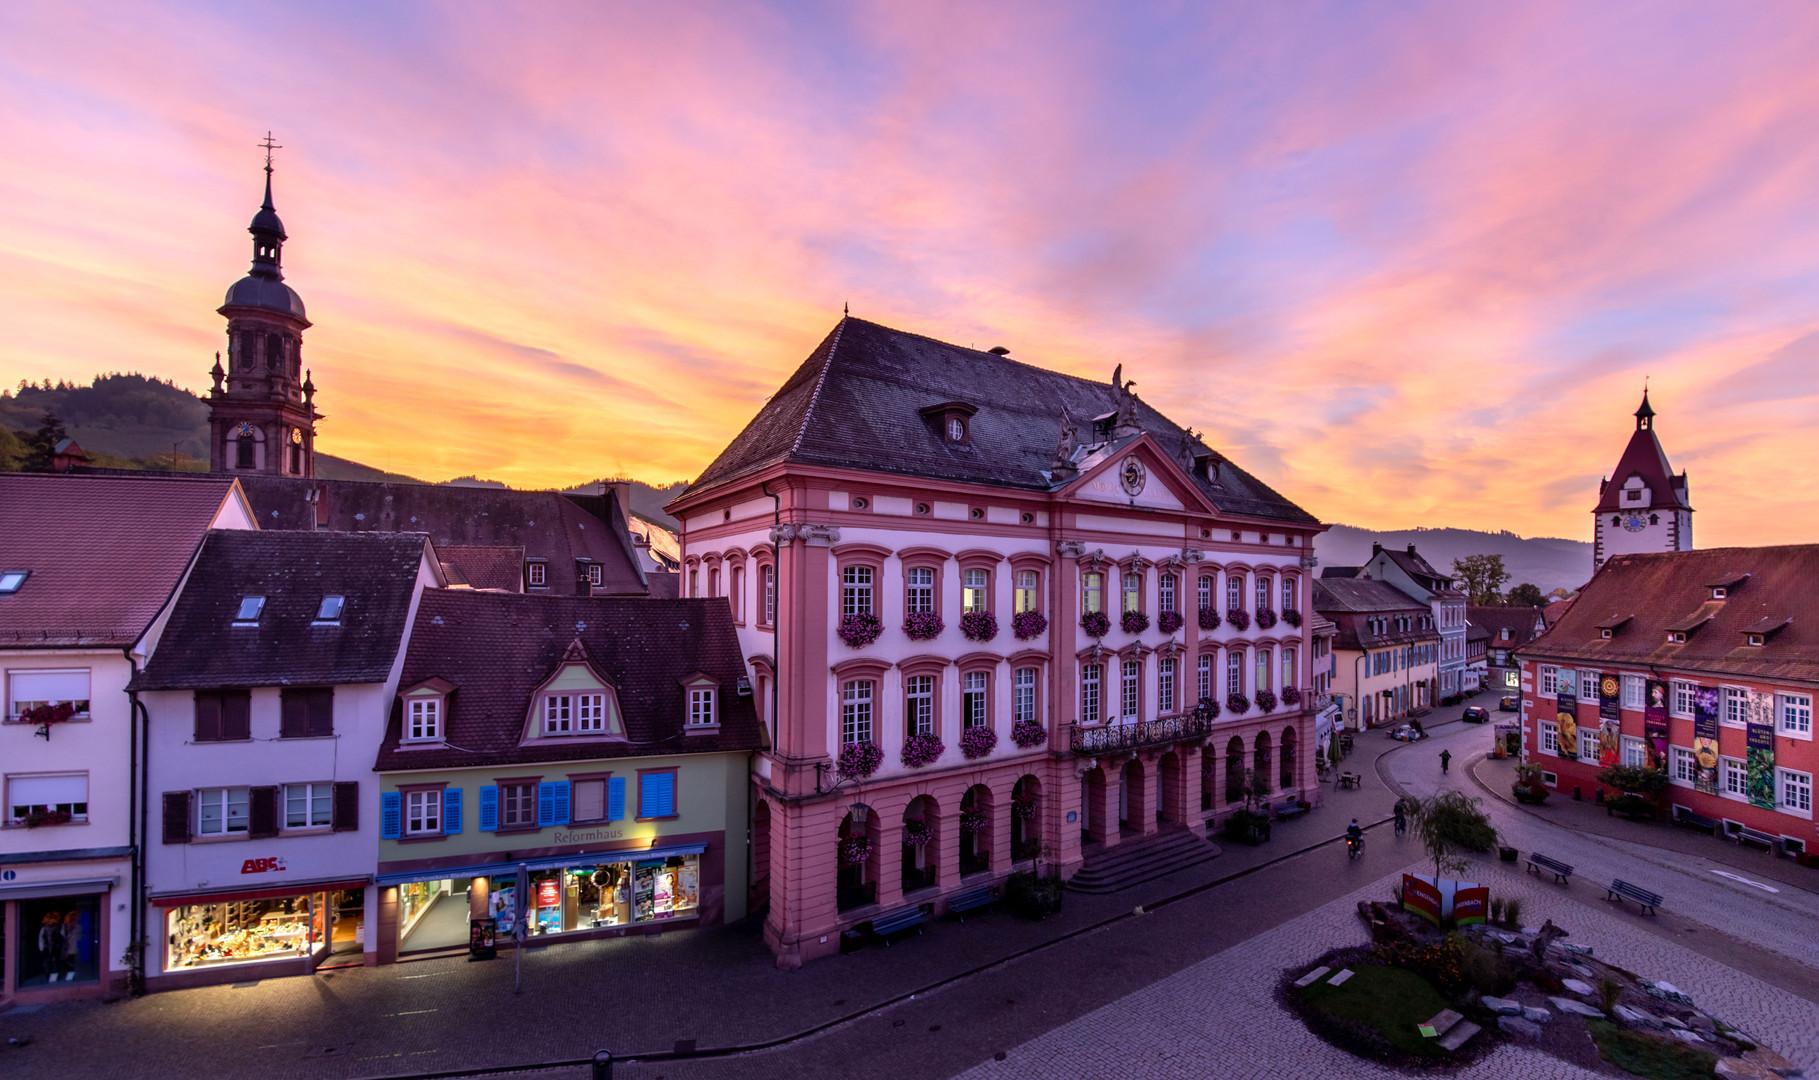 Sunset in Gengenbach